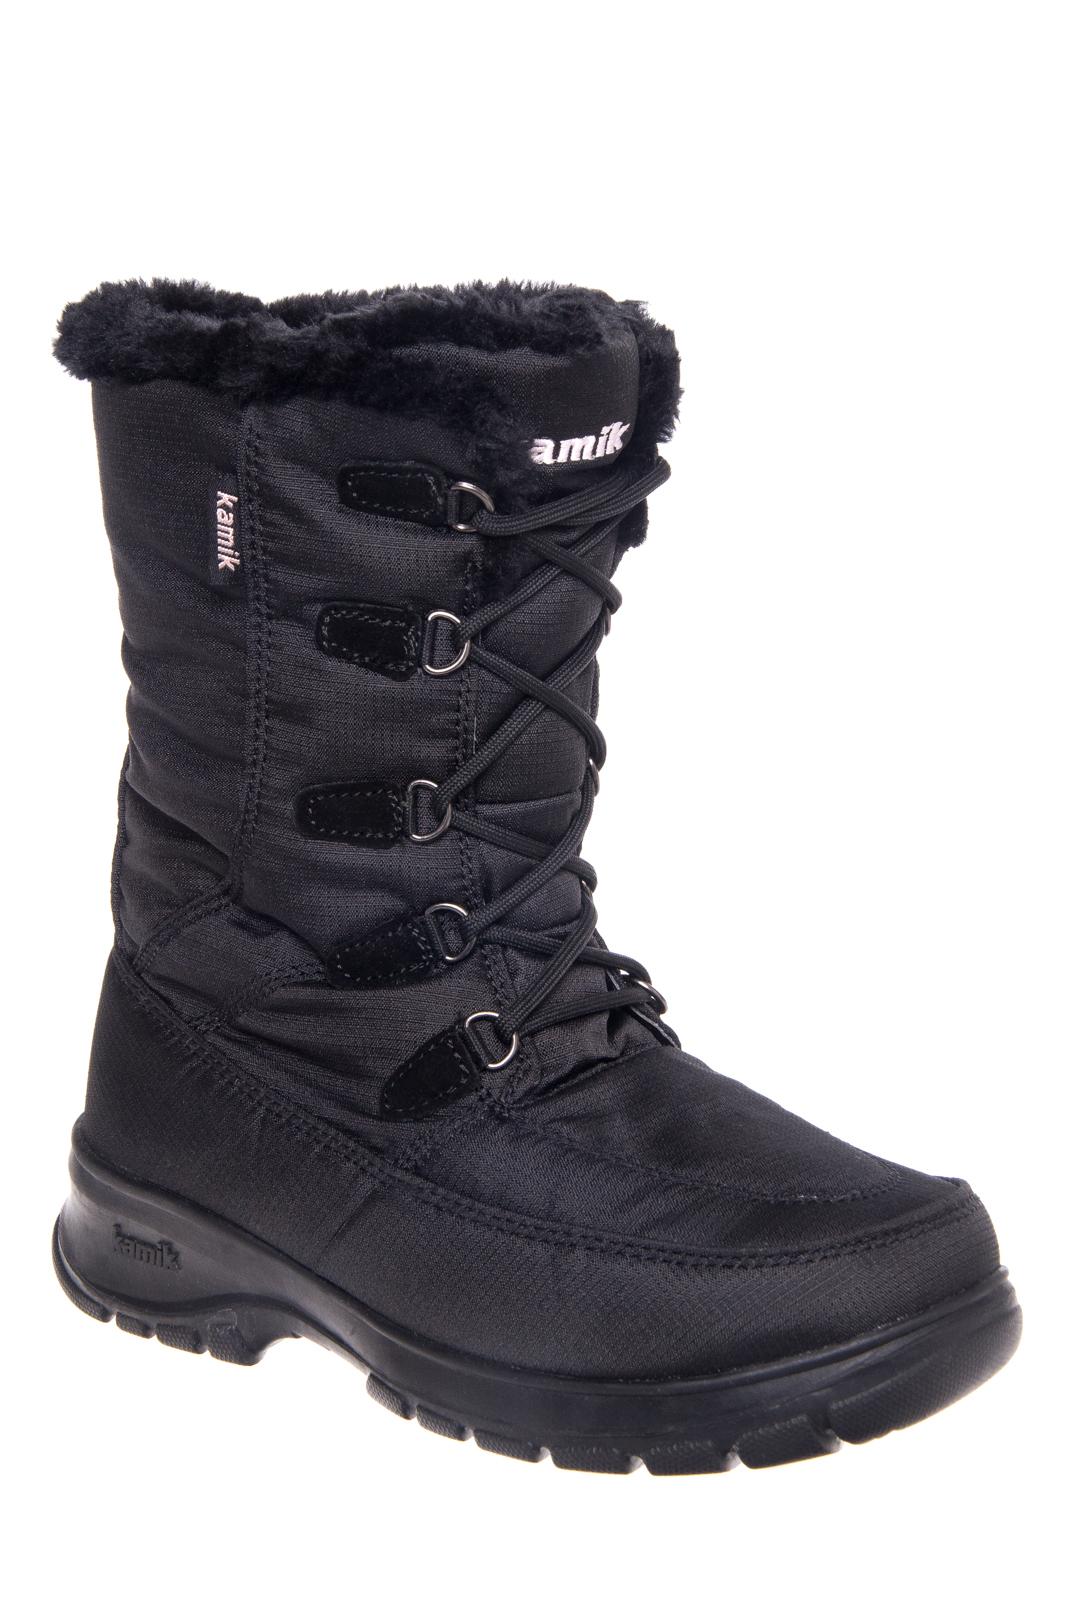 KAMIK Brooklyn Mid Calf Winter Boots - Black